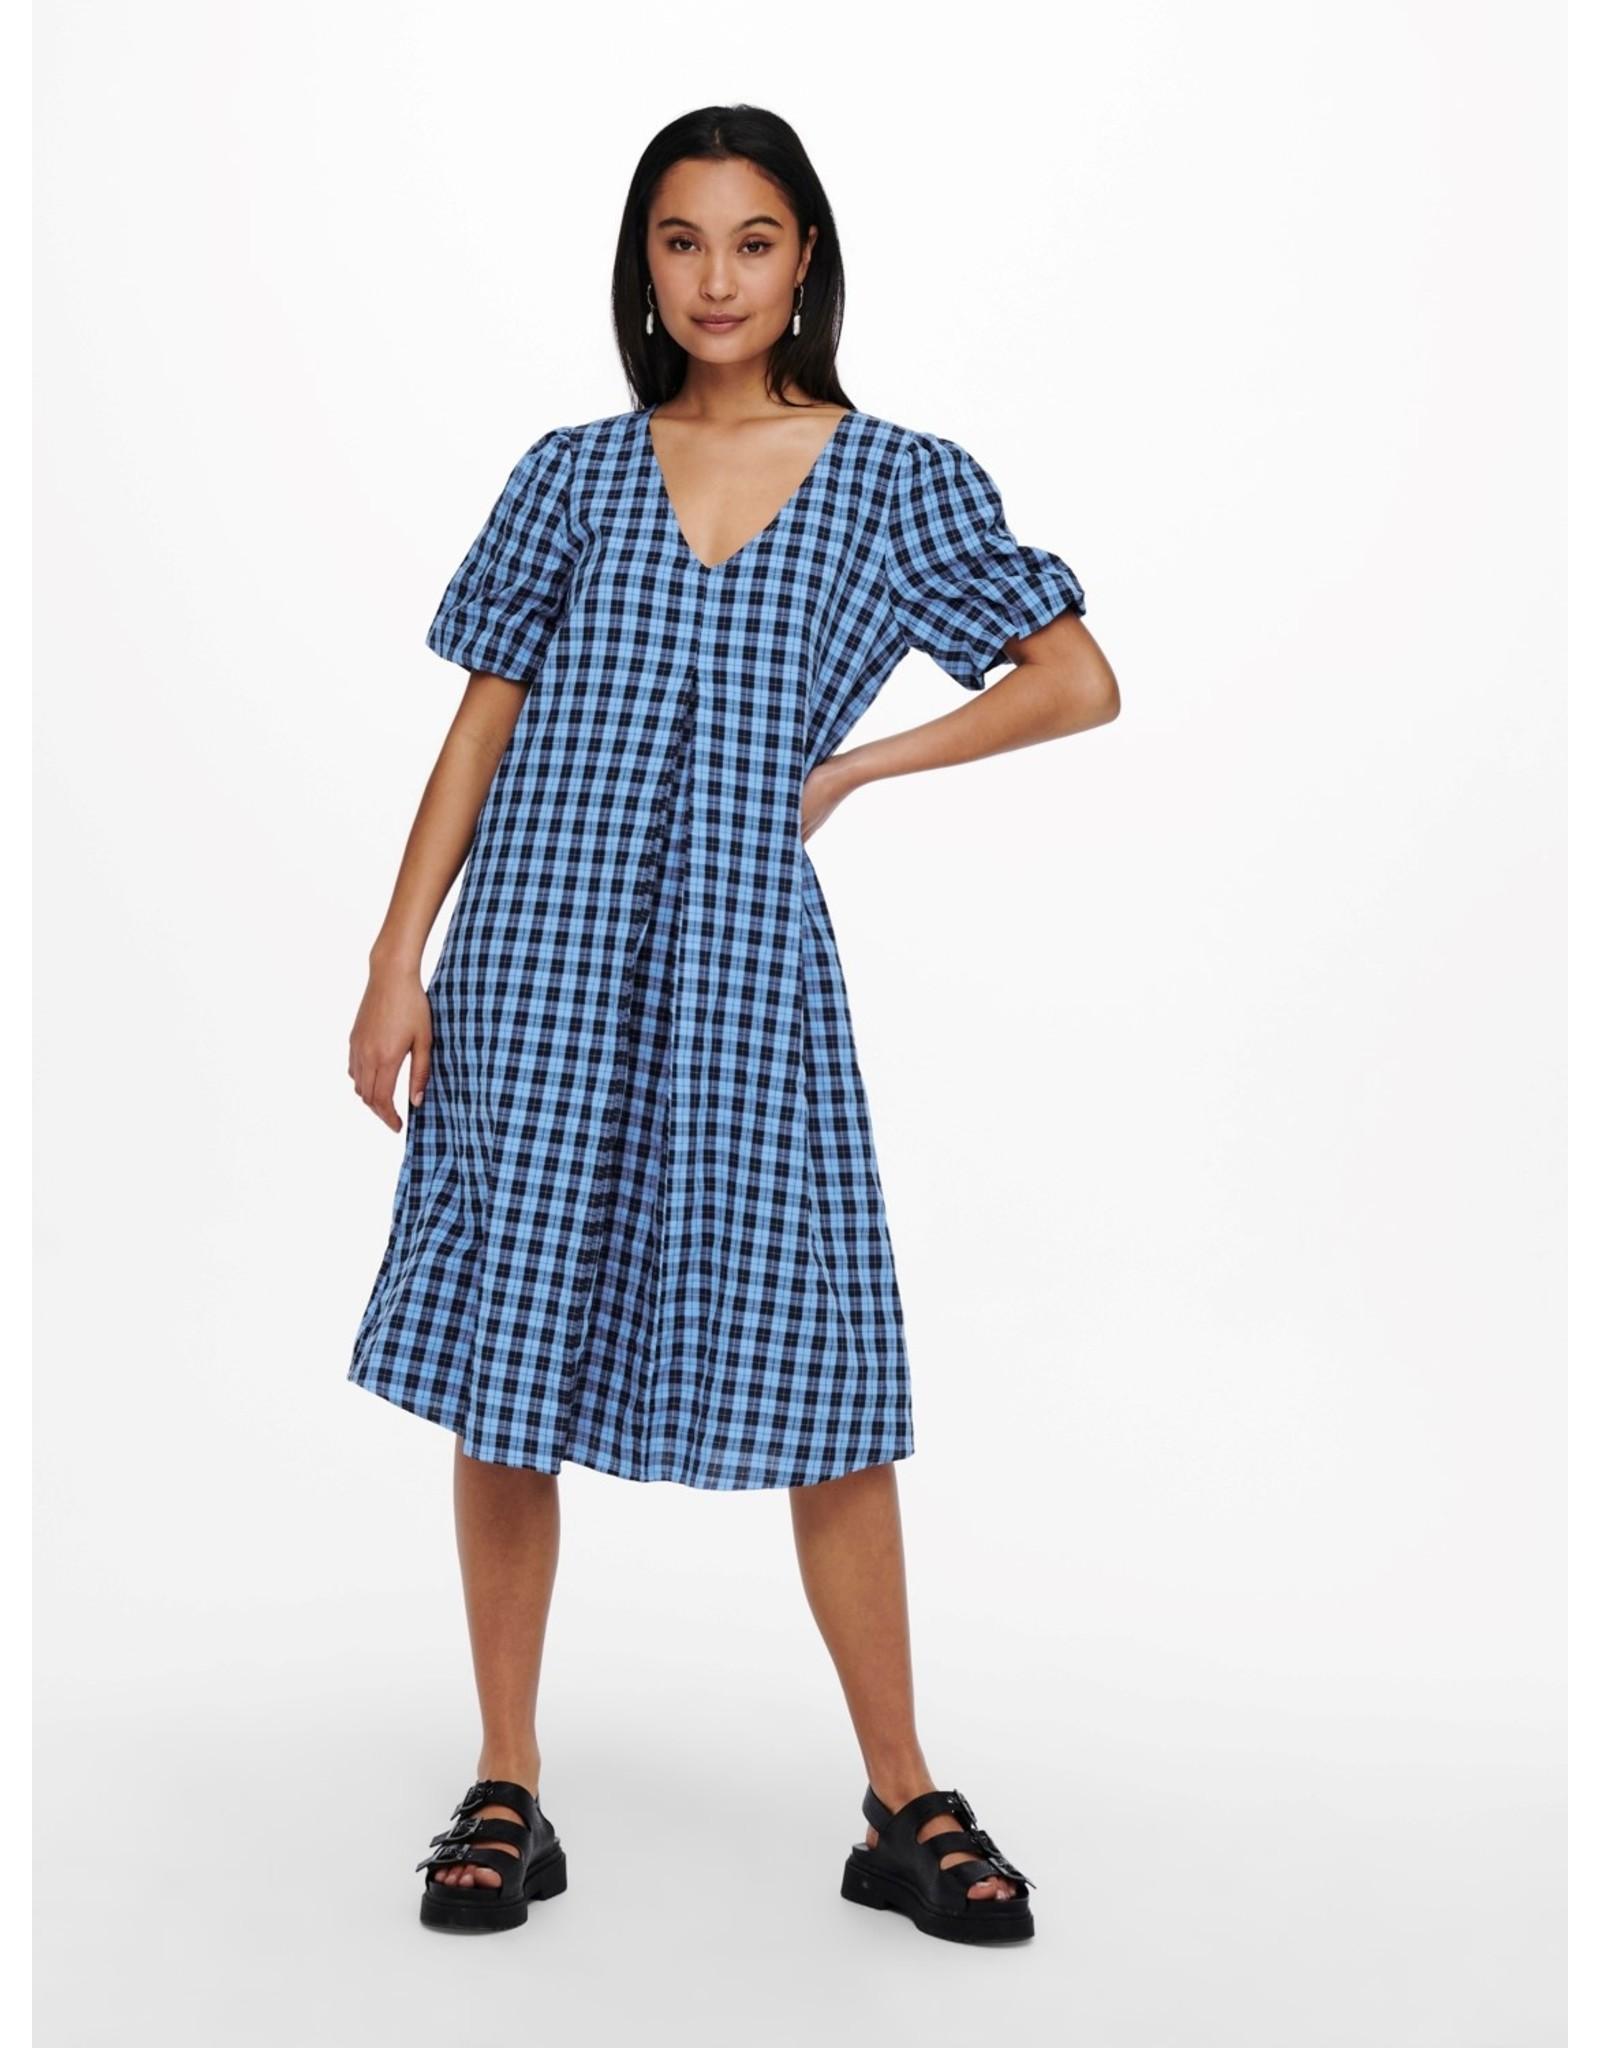 CHICK DRESS BLUE